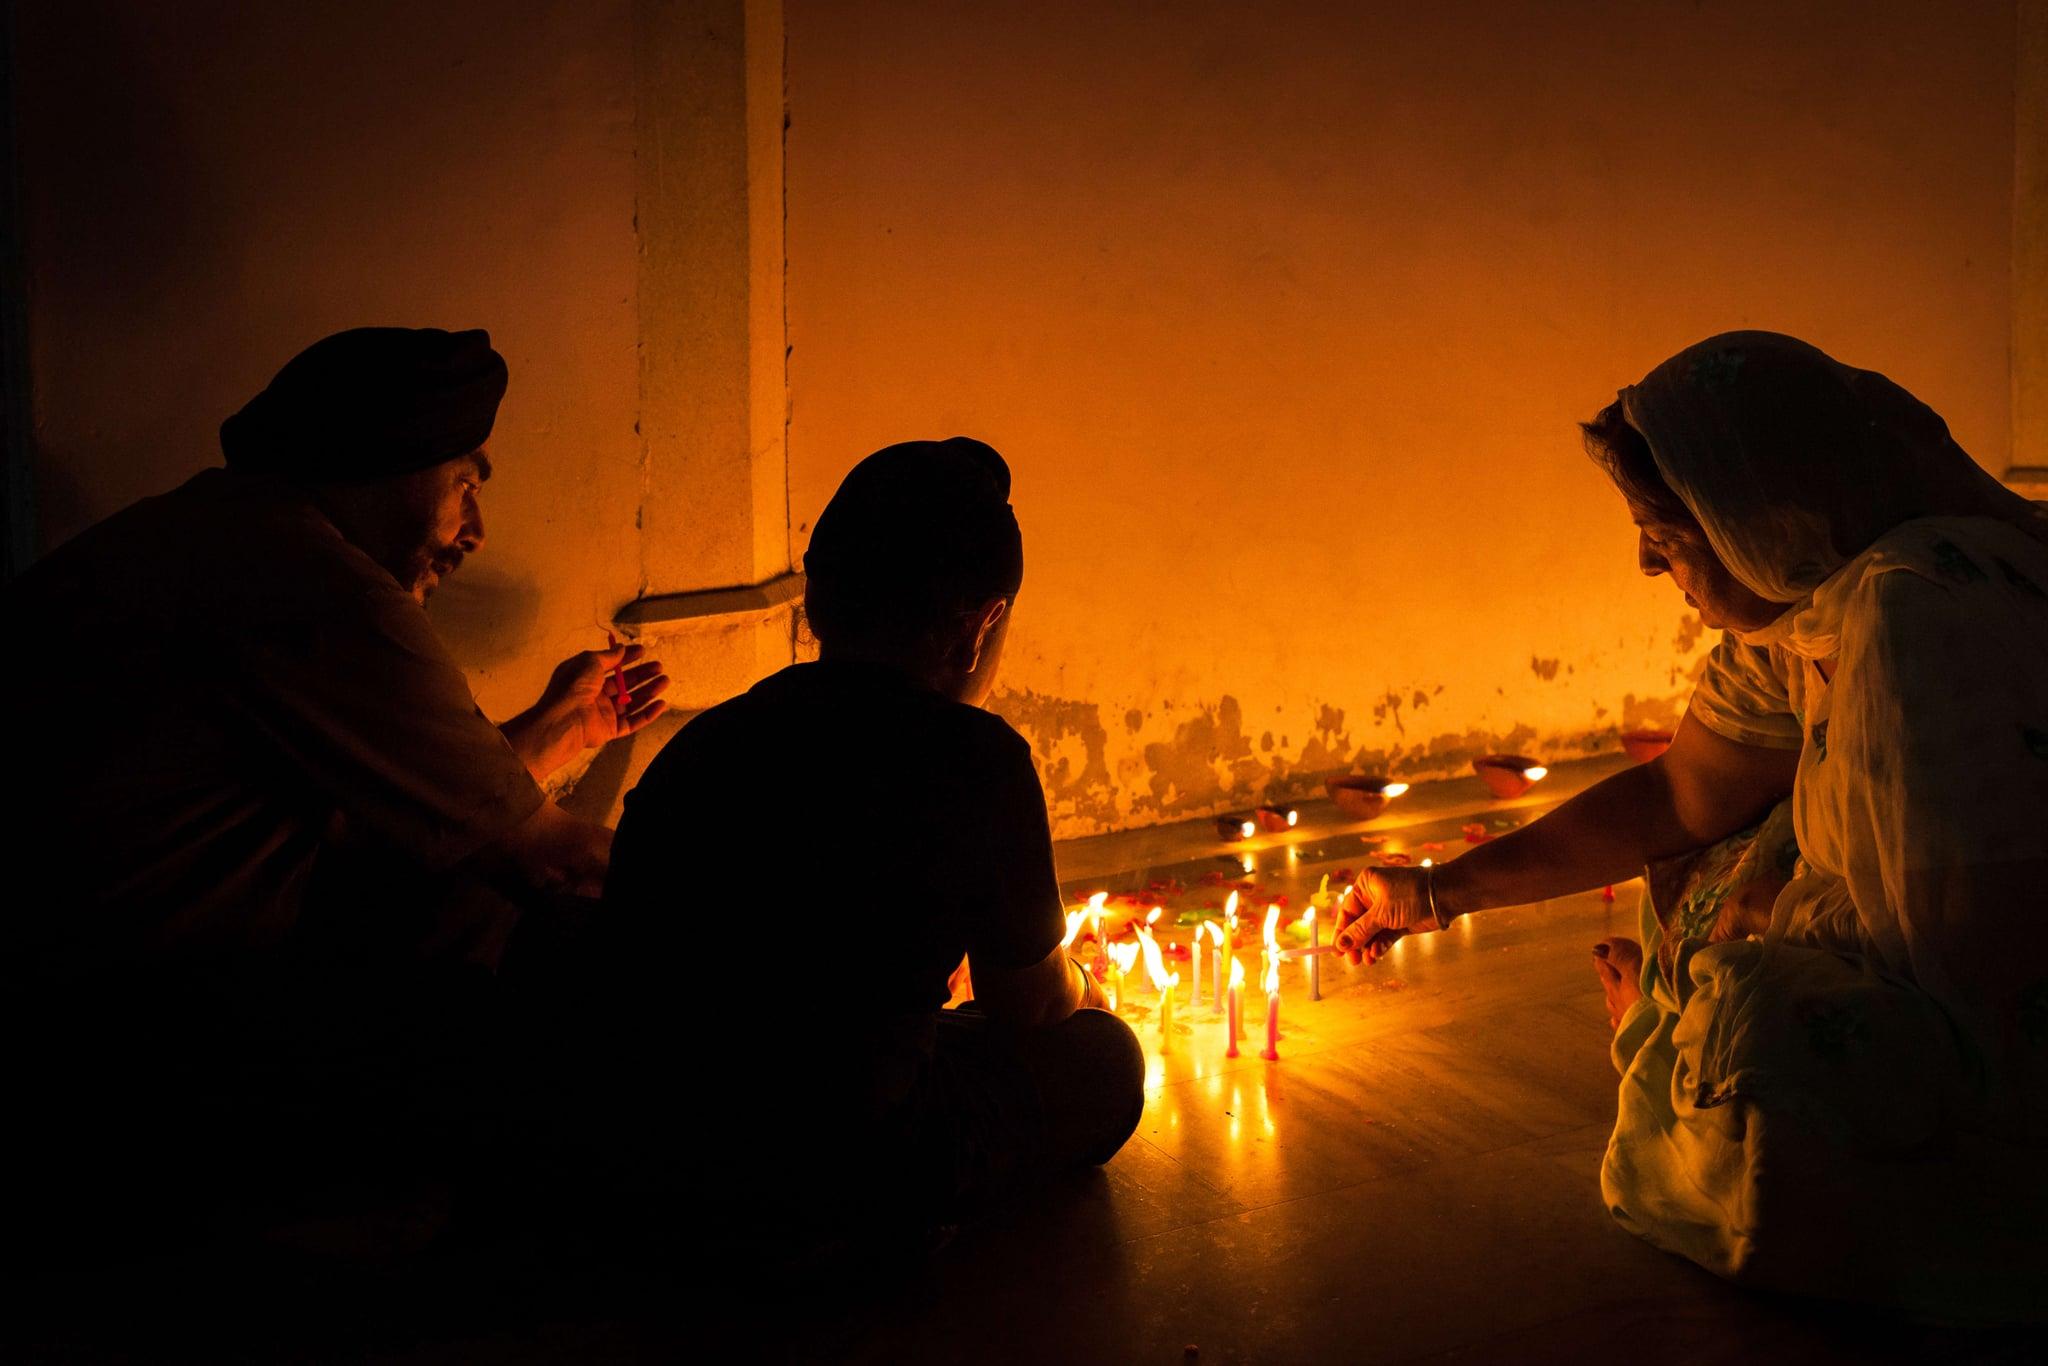 PATIALA, PUNJAB, INDIA - 2014/10/23: Family celebrating Diwali festival night, also Bandi Chhor Divas celebration for the Sikh religion followers at the Gurdwara Dukh Nivaran Sahib in Patiala, Punjab, India. (Photo by Marji Lang/LightRocket via Getty Images)